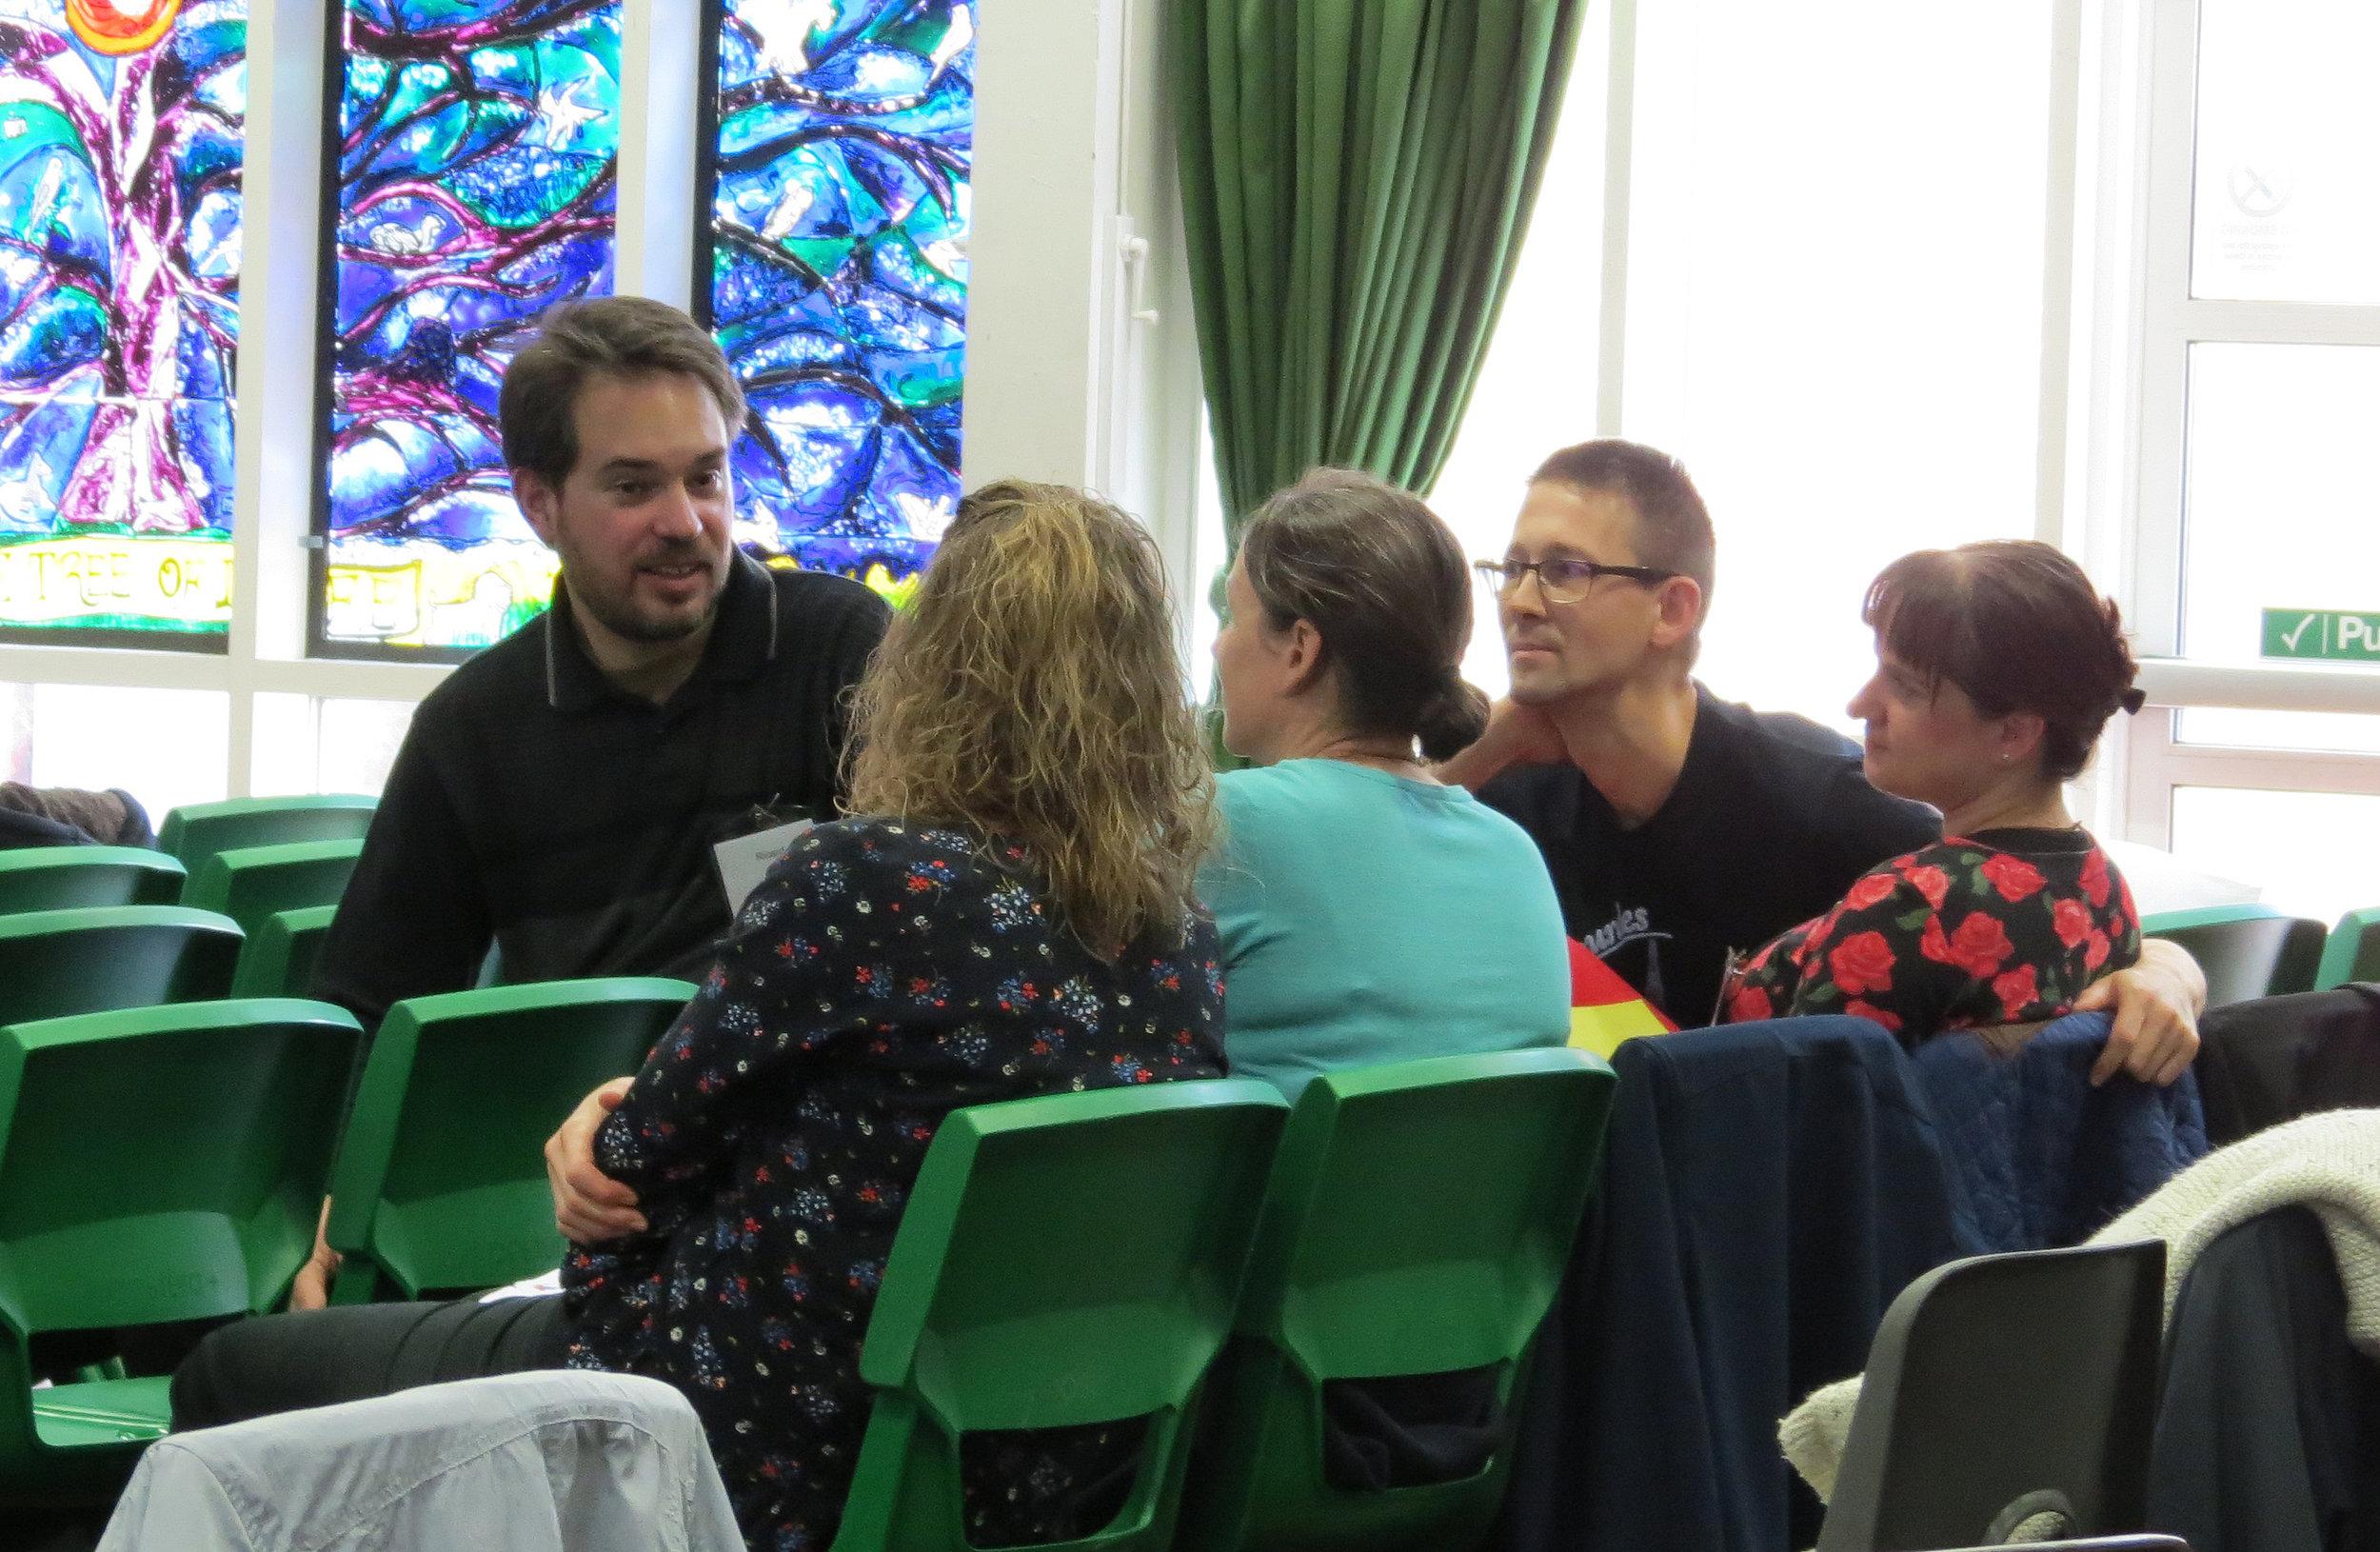 group-chatting.jpg